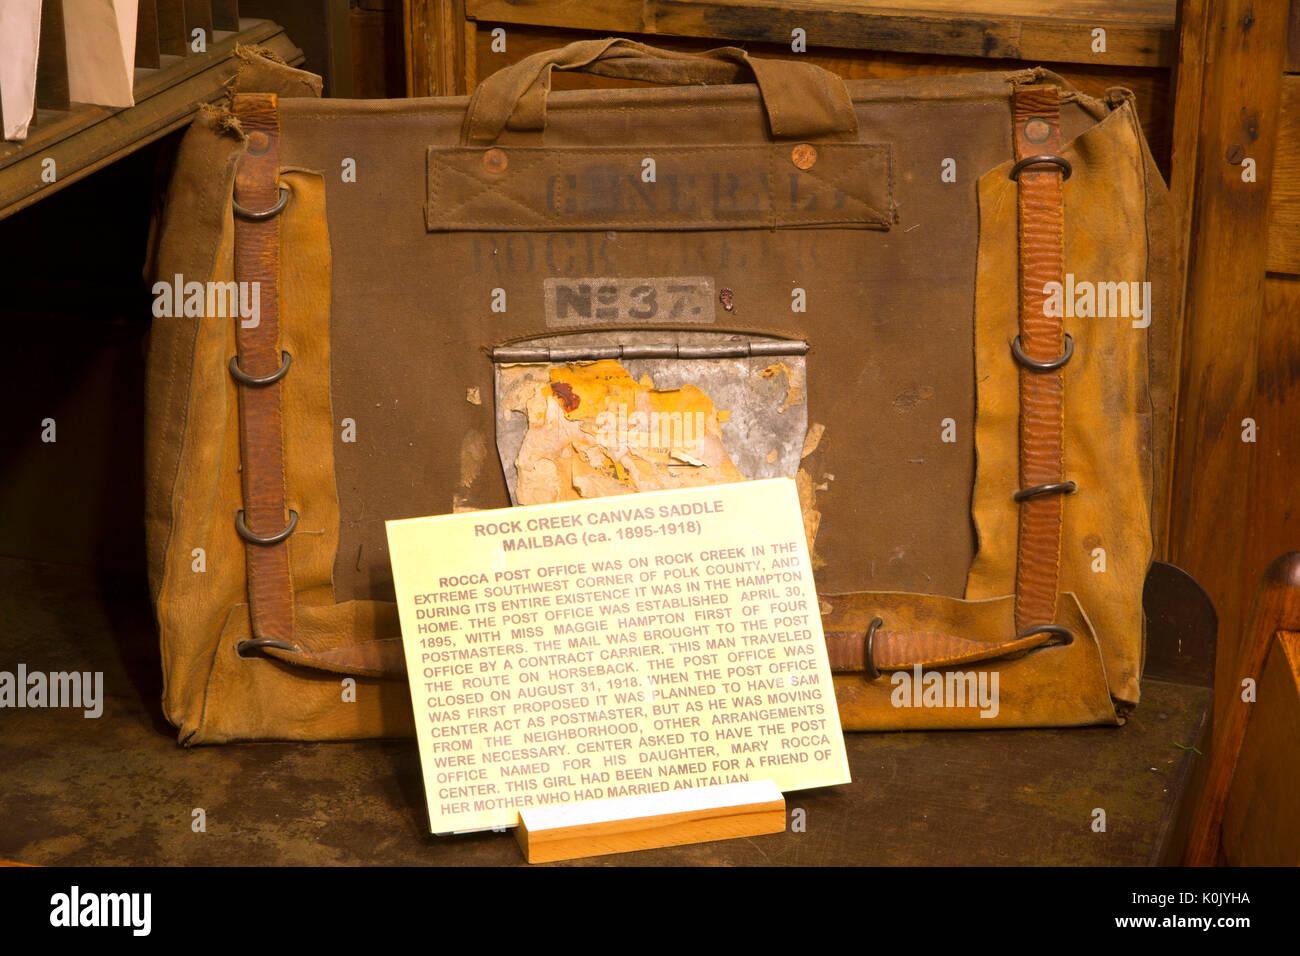 Mailbag, Polk County Museum, Rickreall, Oregon - Stock Image